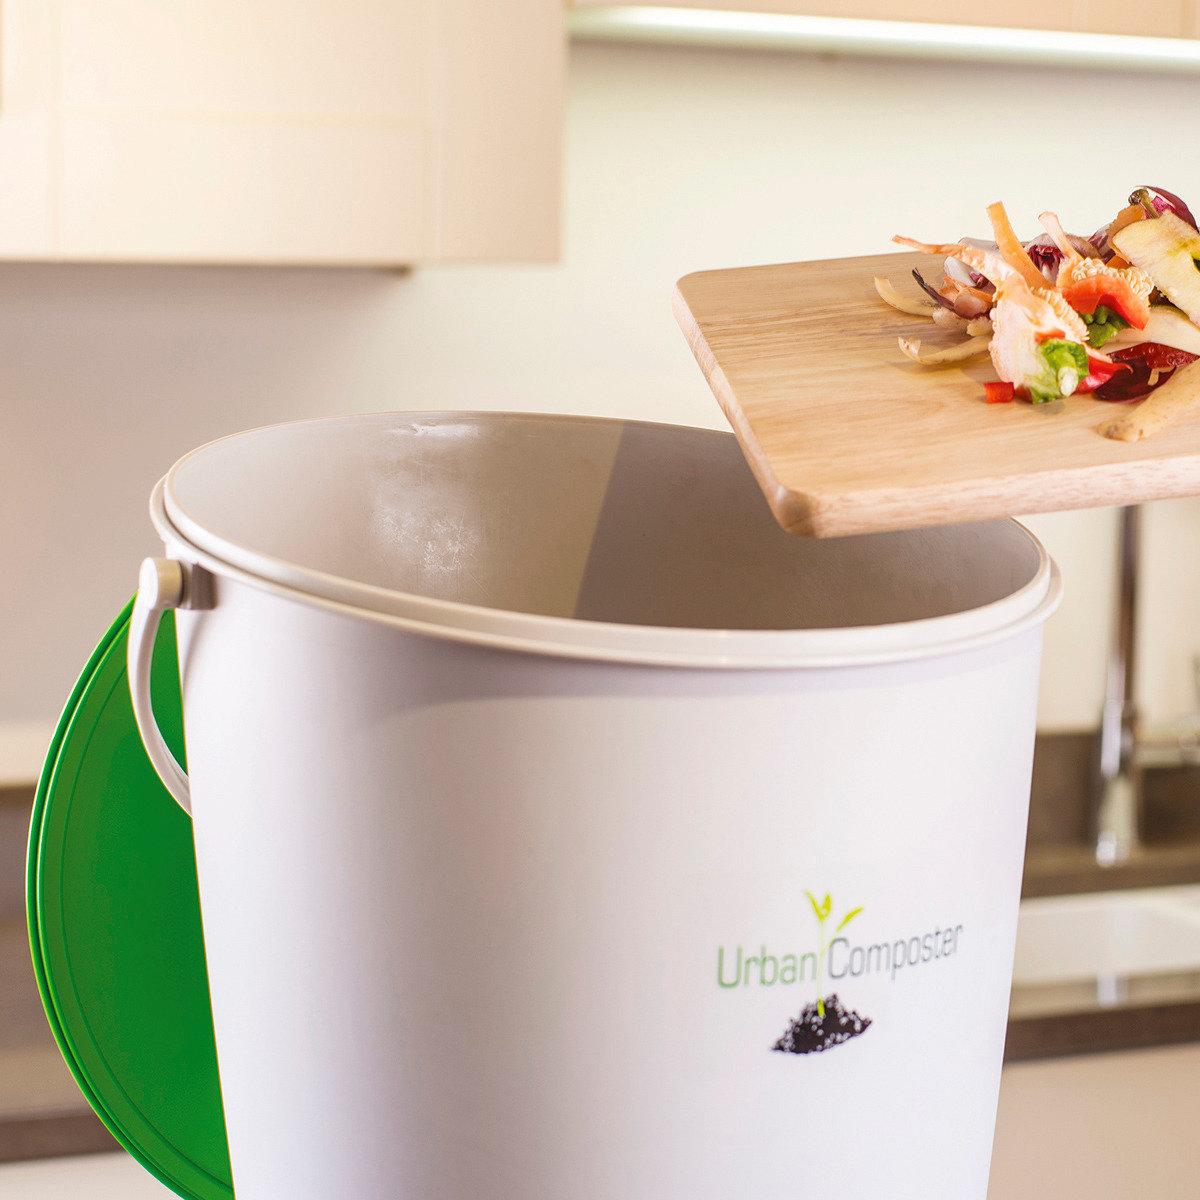 Urban Komposter 15 Liter, inkl. Kompost Beschleuniger | #2